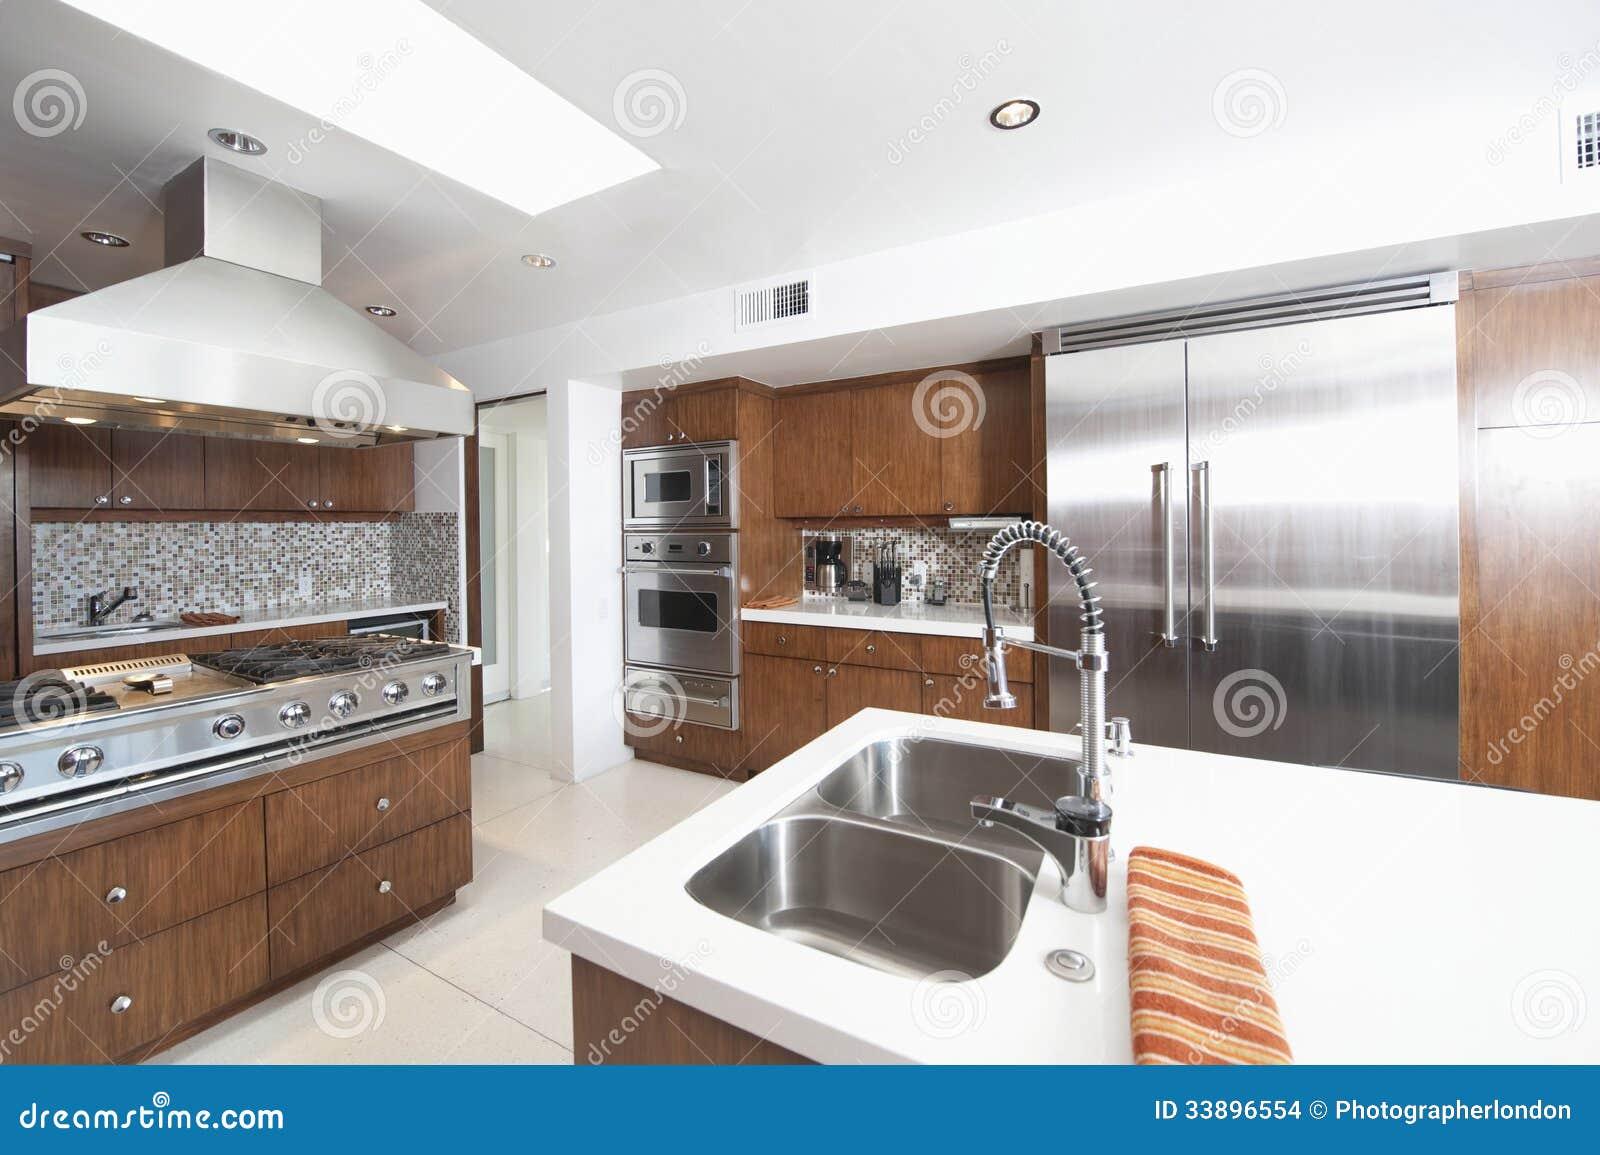 holz-und edelstahl-küche stockbilder - bild: 33896554